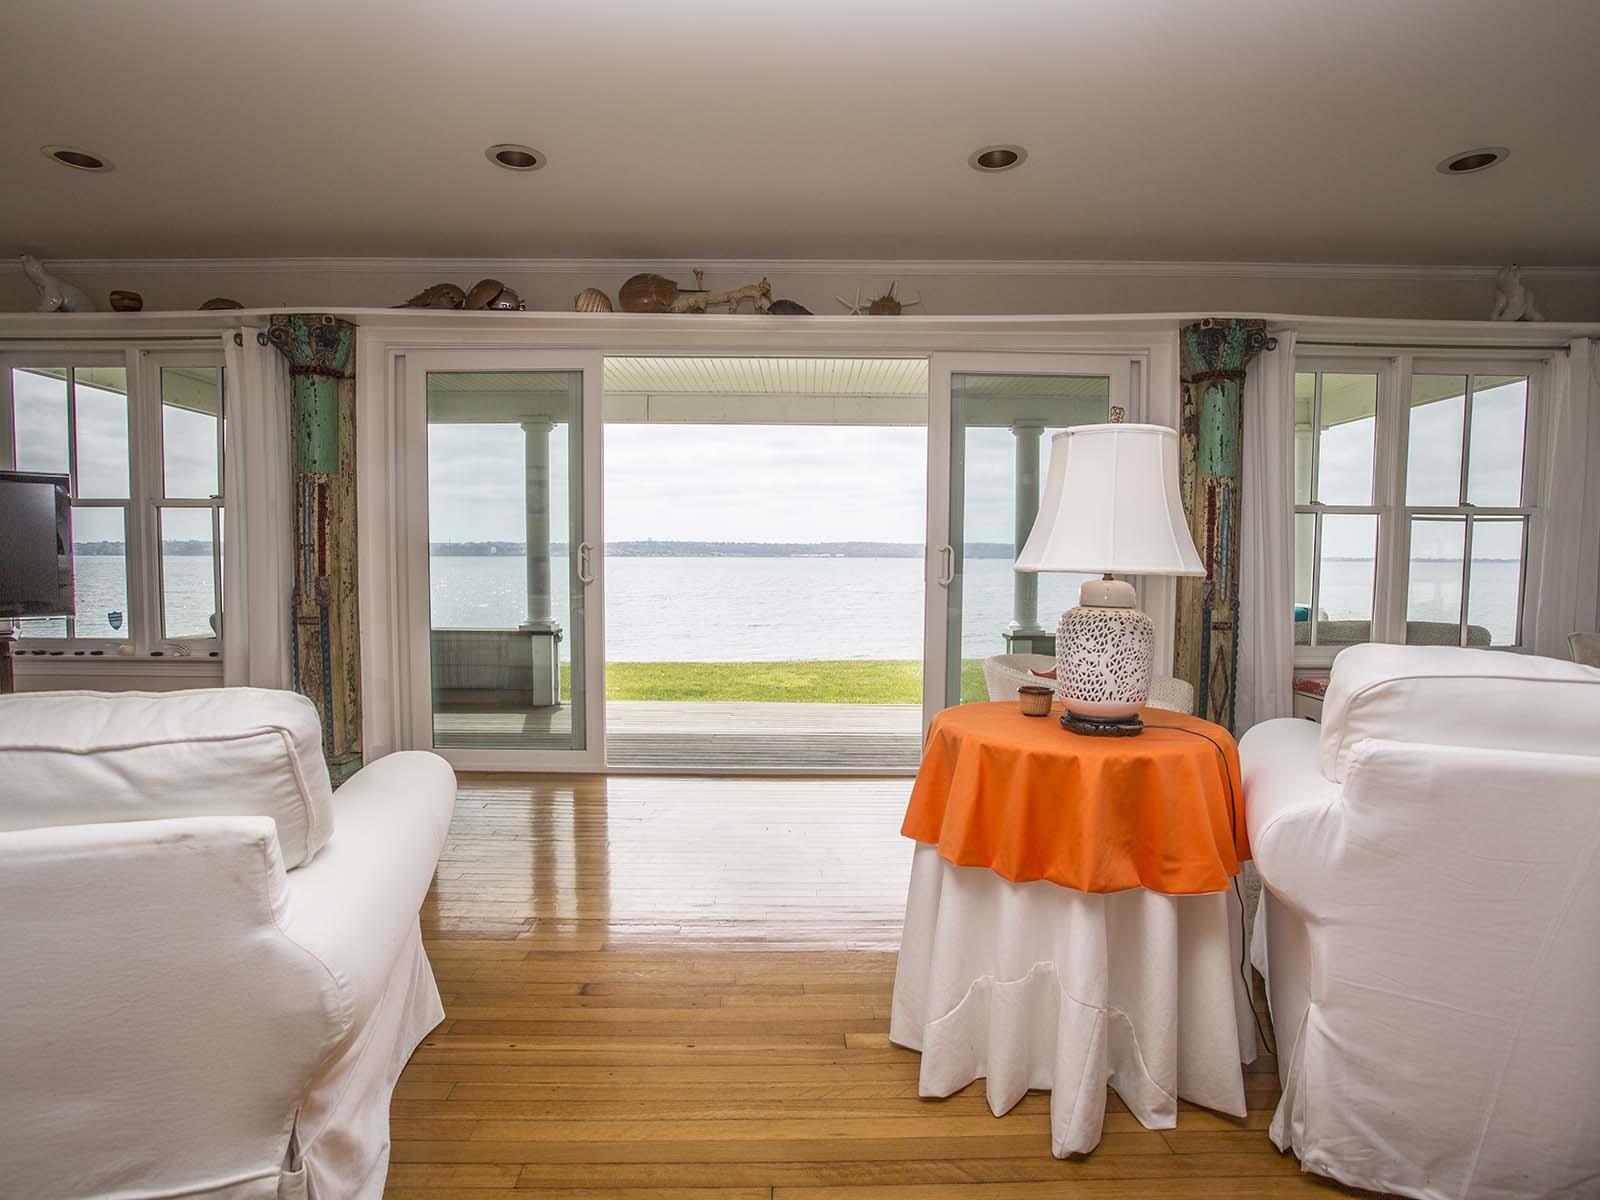 Additional photo for property listing at Touisset Seaside Cottage 4 Calder Drive 沃伦, 罗得岛 02885 美国